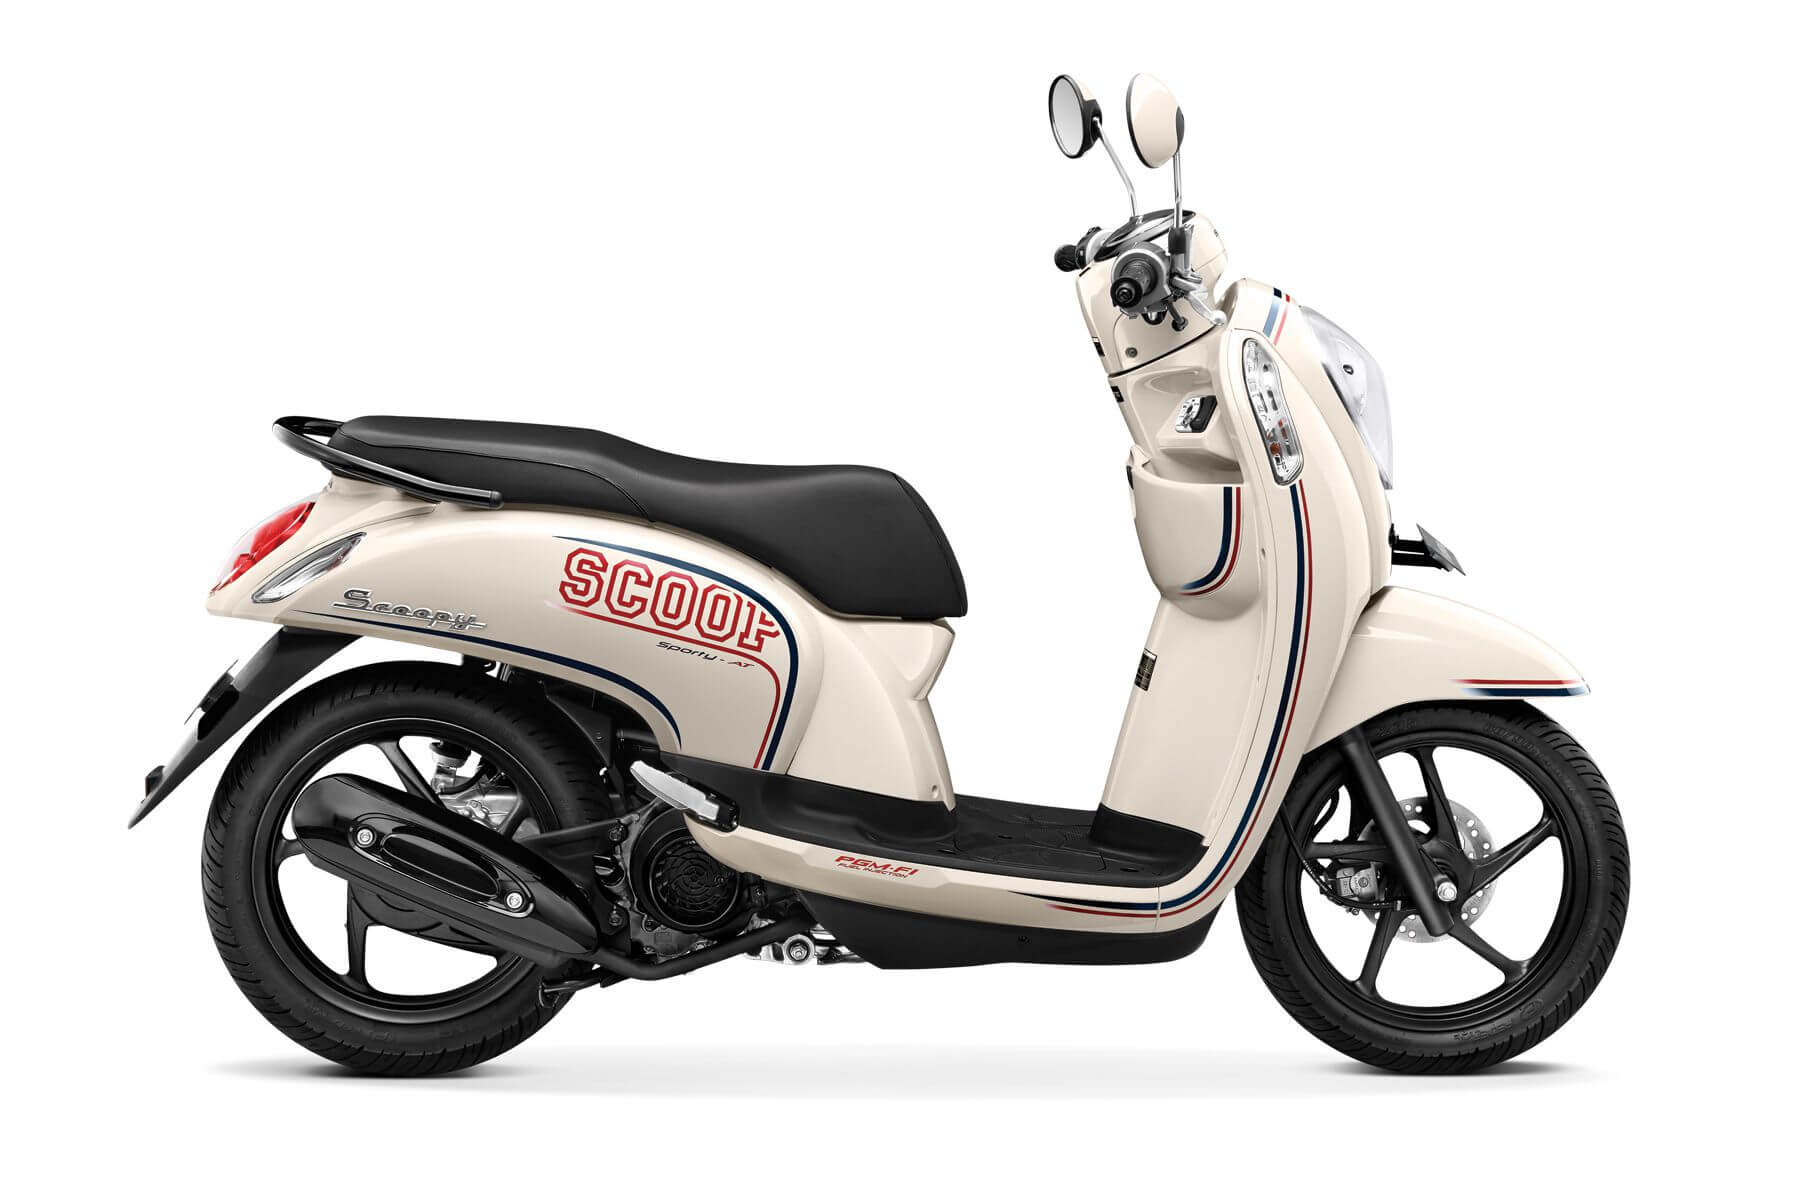 Honda Scoopy Generasi Kedua